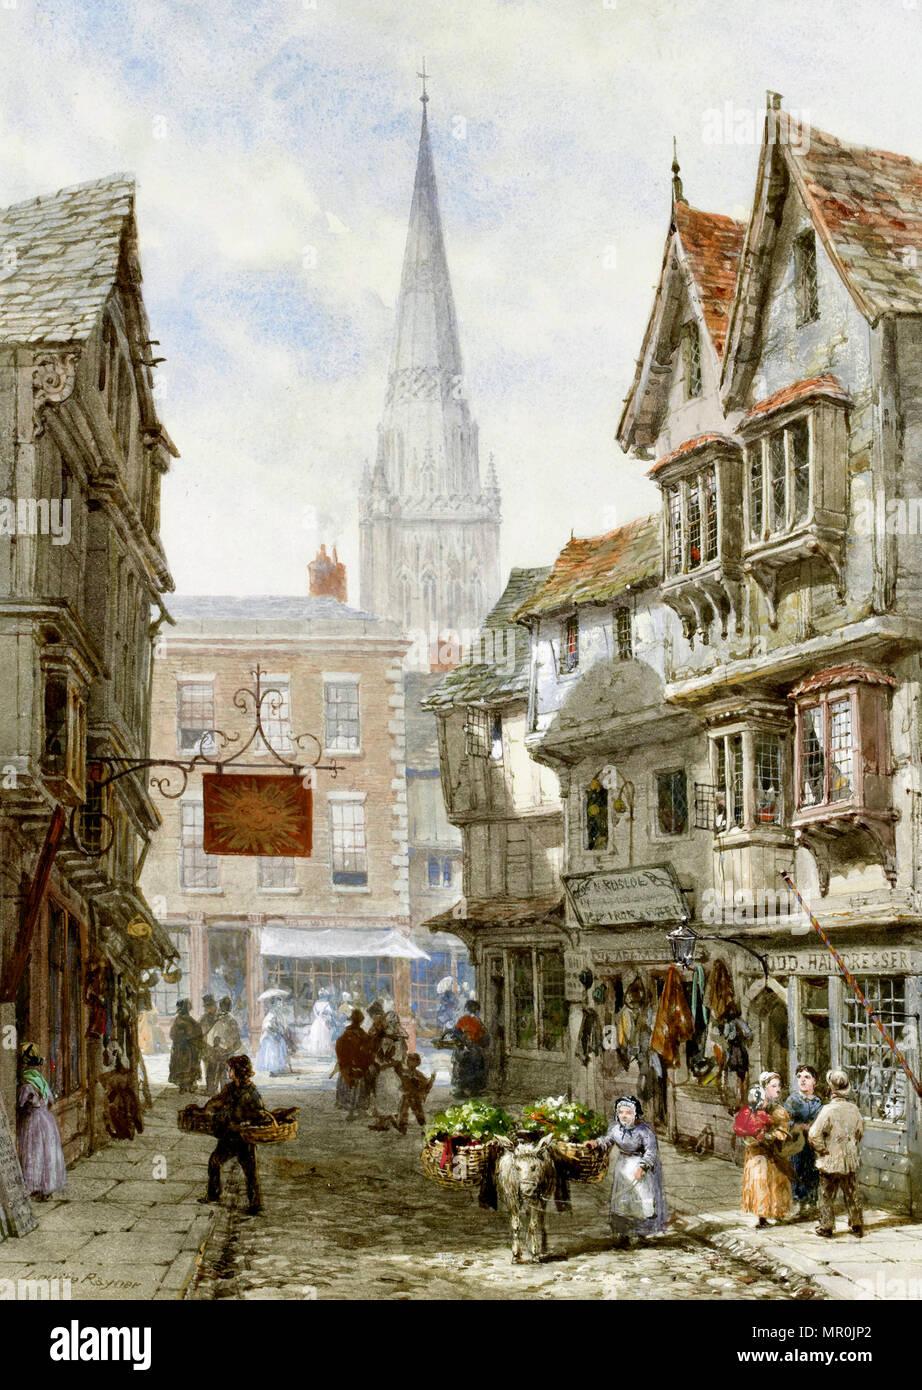 Minster Street, Salisbury. Firmato Louise Rayneri. Acquarello e tempera, 1924 Immagini Stock